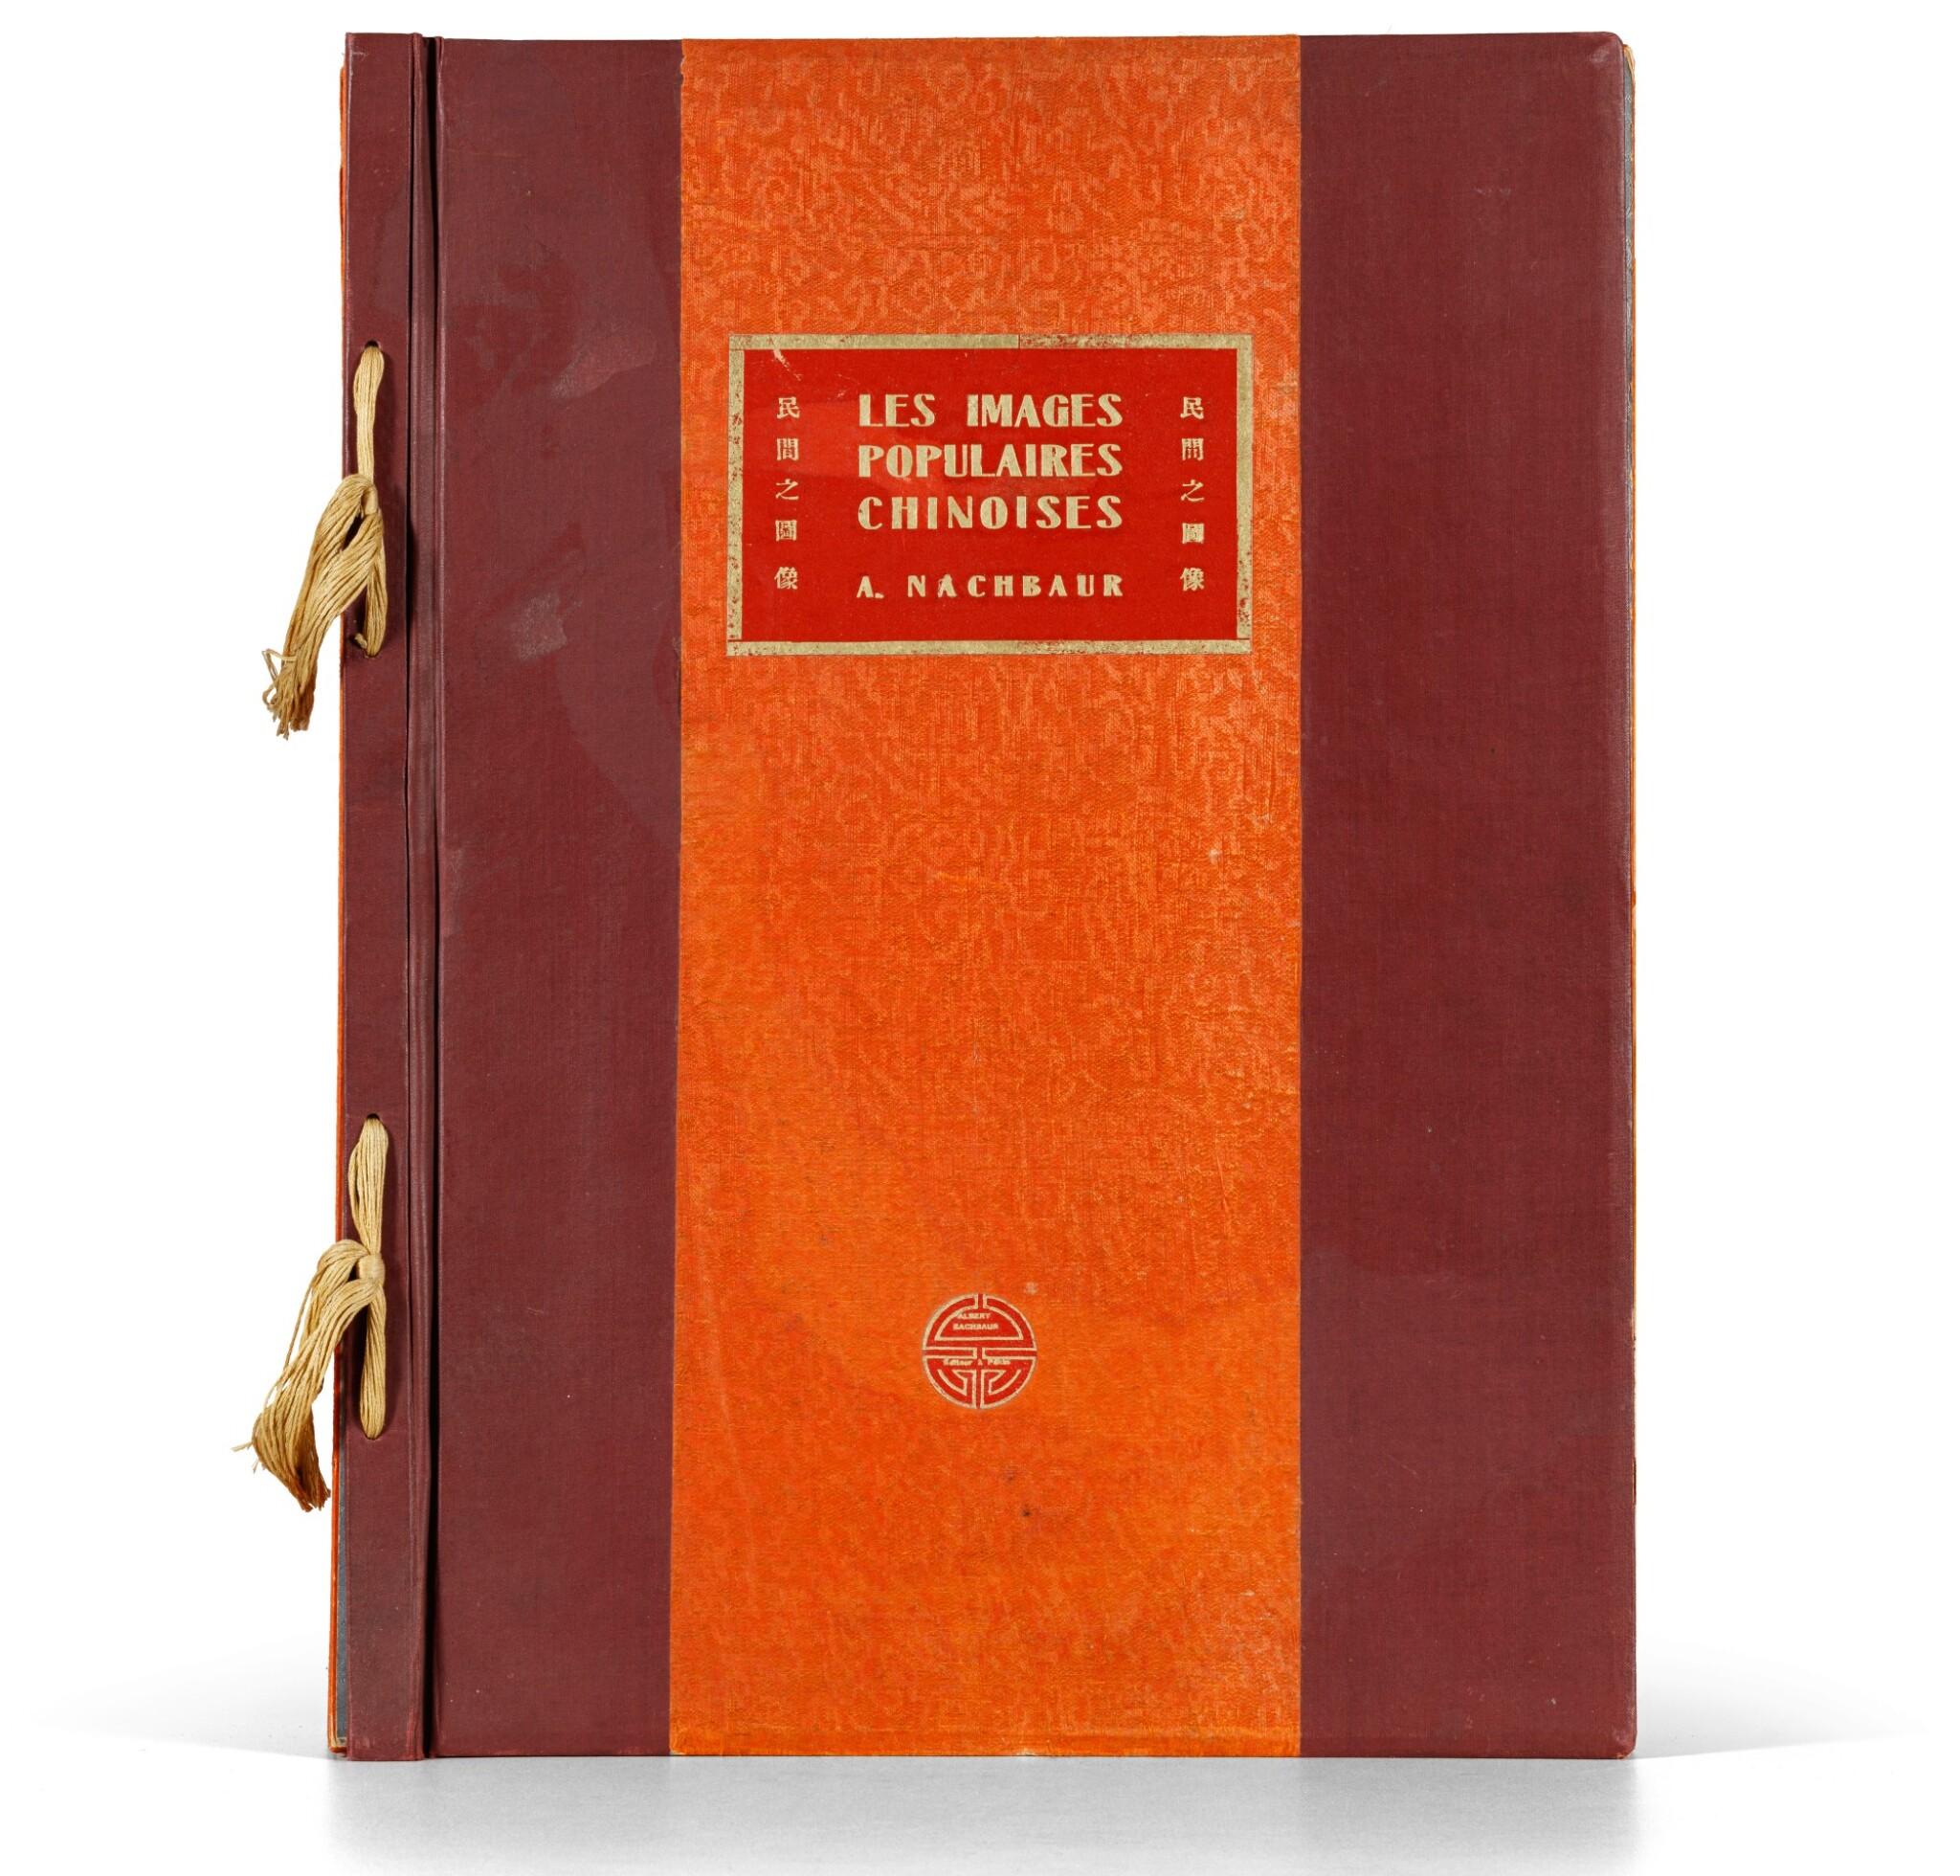 View 1 of Lot 118. Nachbaur, Albert and Wâng Ngen Joûng LES IMAGES POPULAIRES CHINOISES. MÎN, KIE'N, TCHE', T'OU, SIA'NG. [PÉKIN: NA CHE PAO, 1931] | 那世寶、 王恩榮 民間之圖像 1931年 | Nachbaur, Albert and Wâng Ngen JoûngLES IMAGES POPULAIRES CHINOISES. MÎN, KIÉN, TCHÉ, T'OU, SIÁNG. [PÉKIN: NA CHE PAO, 1931].